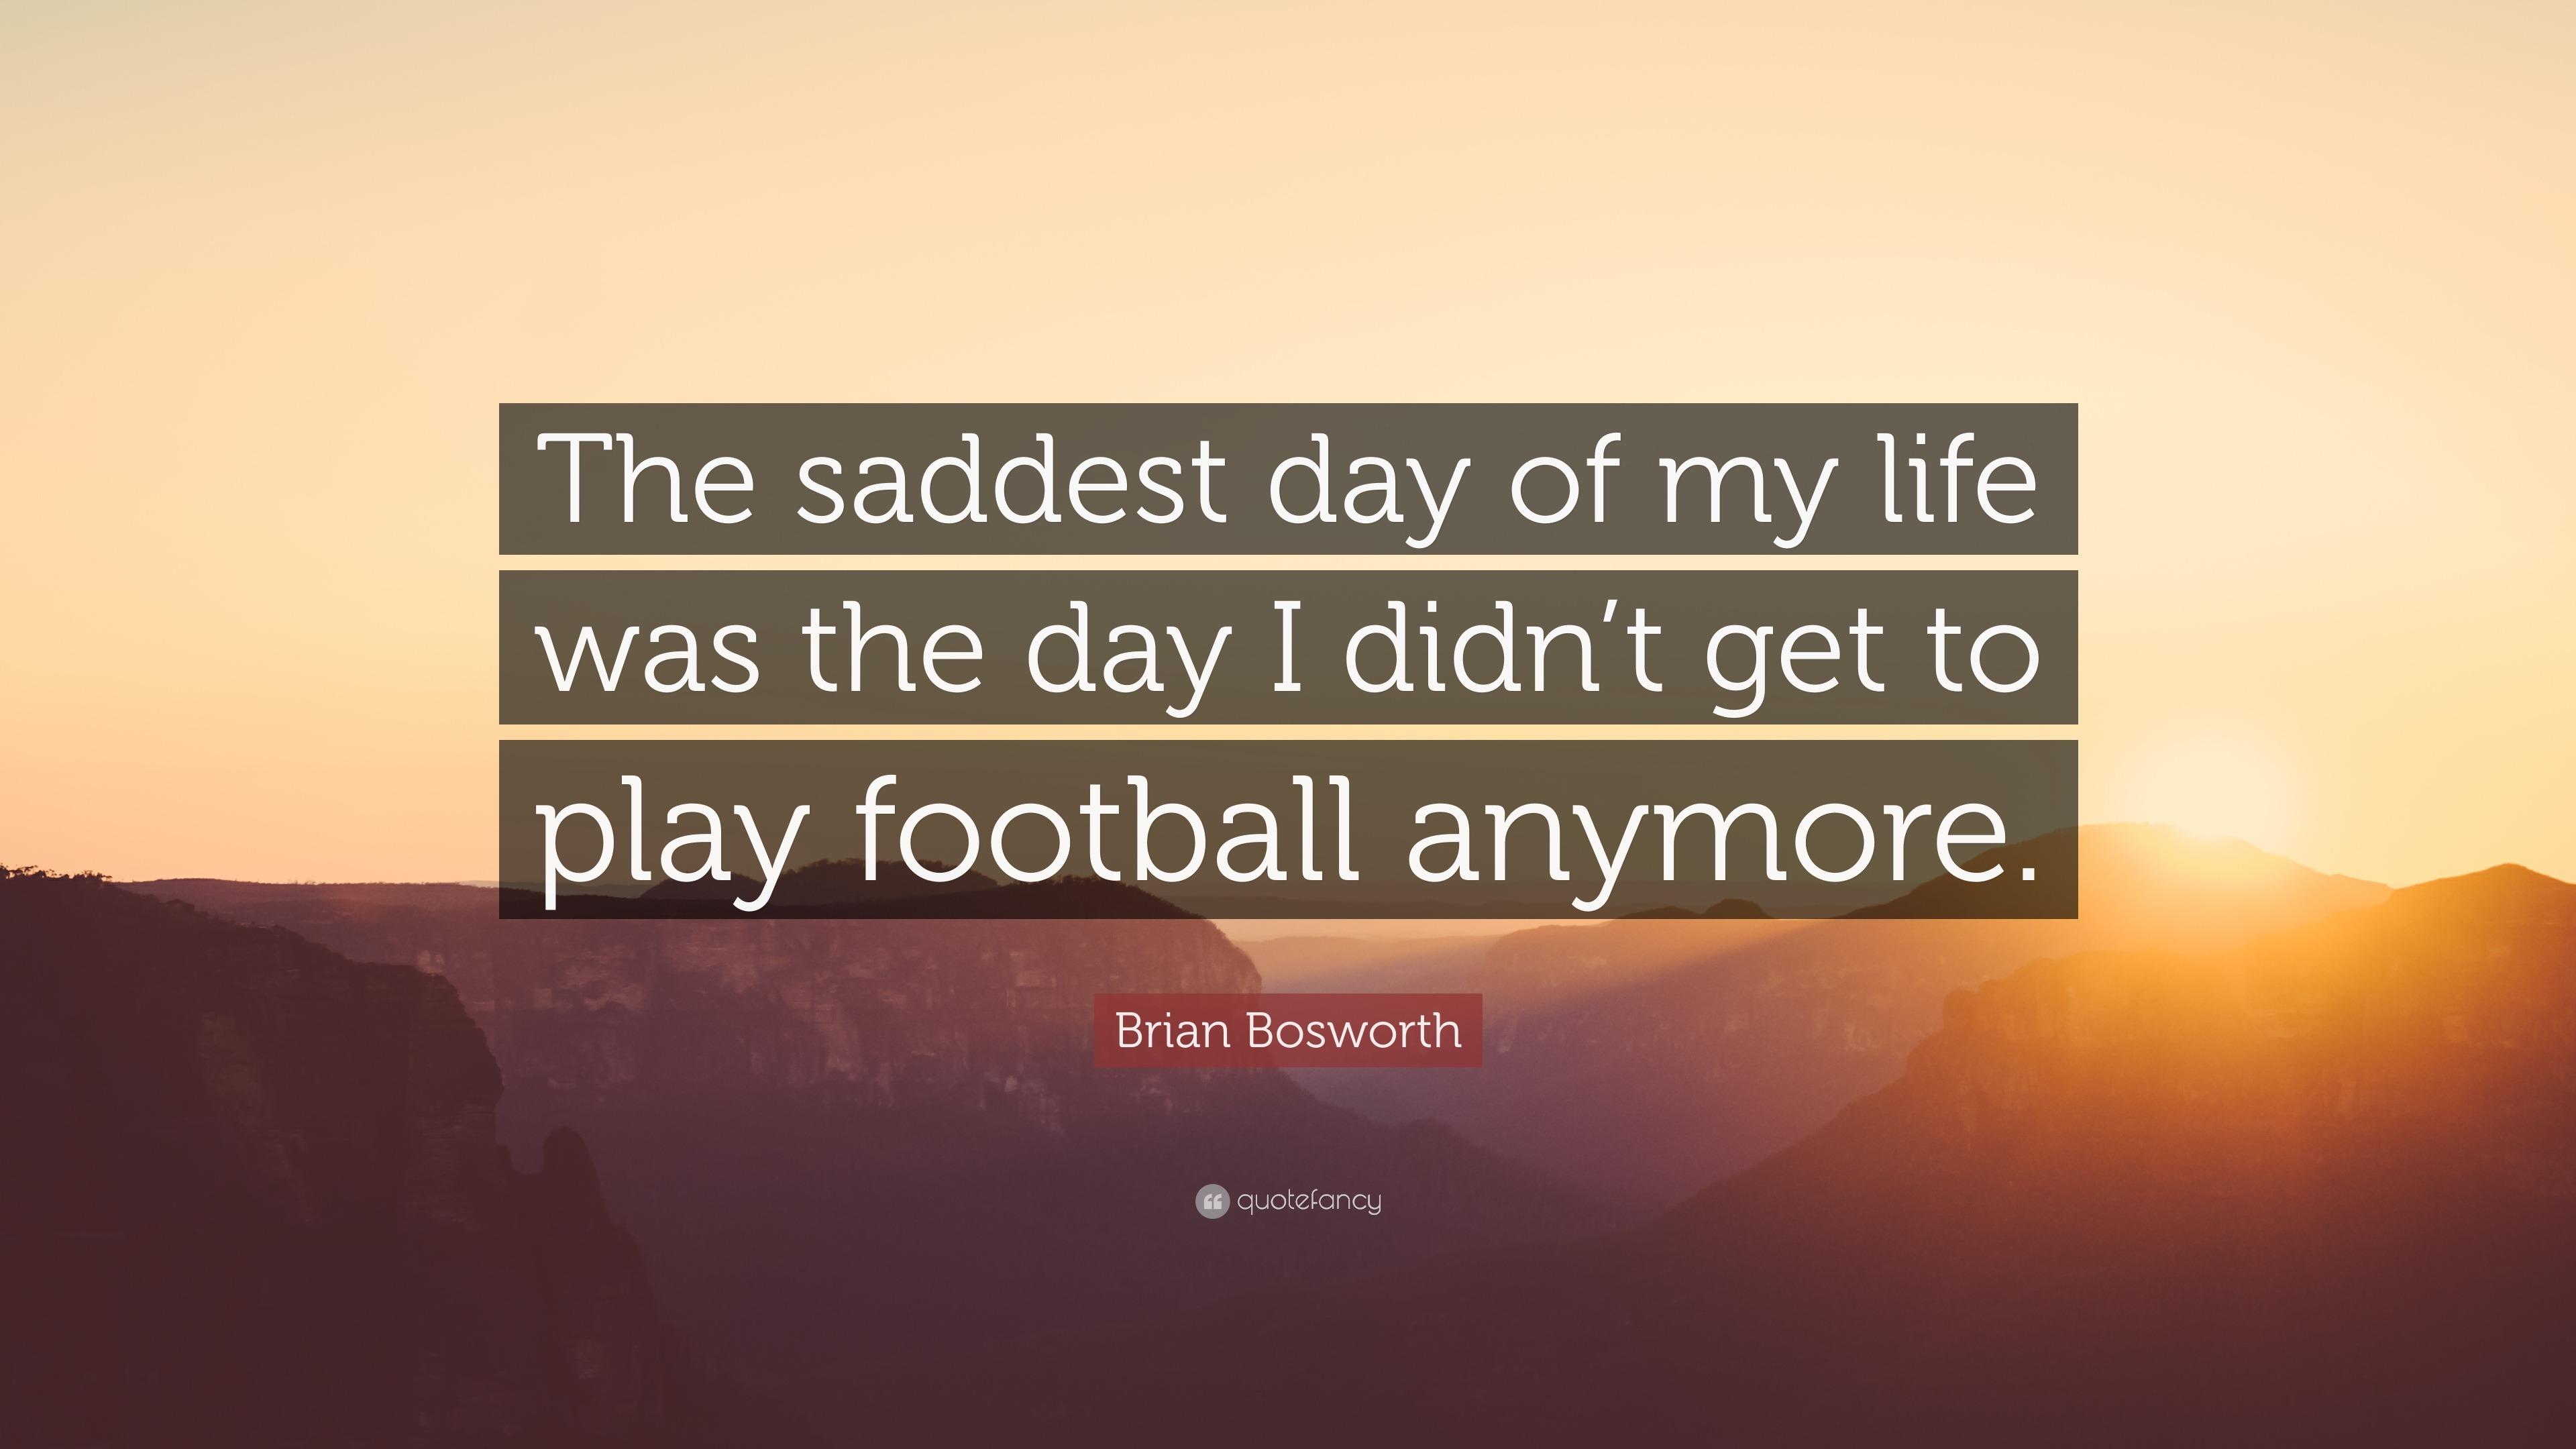 saddest day of my life